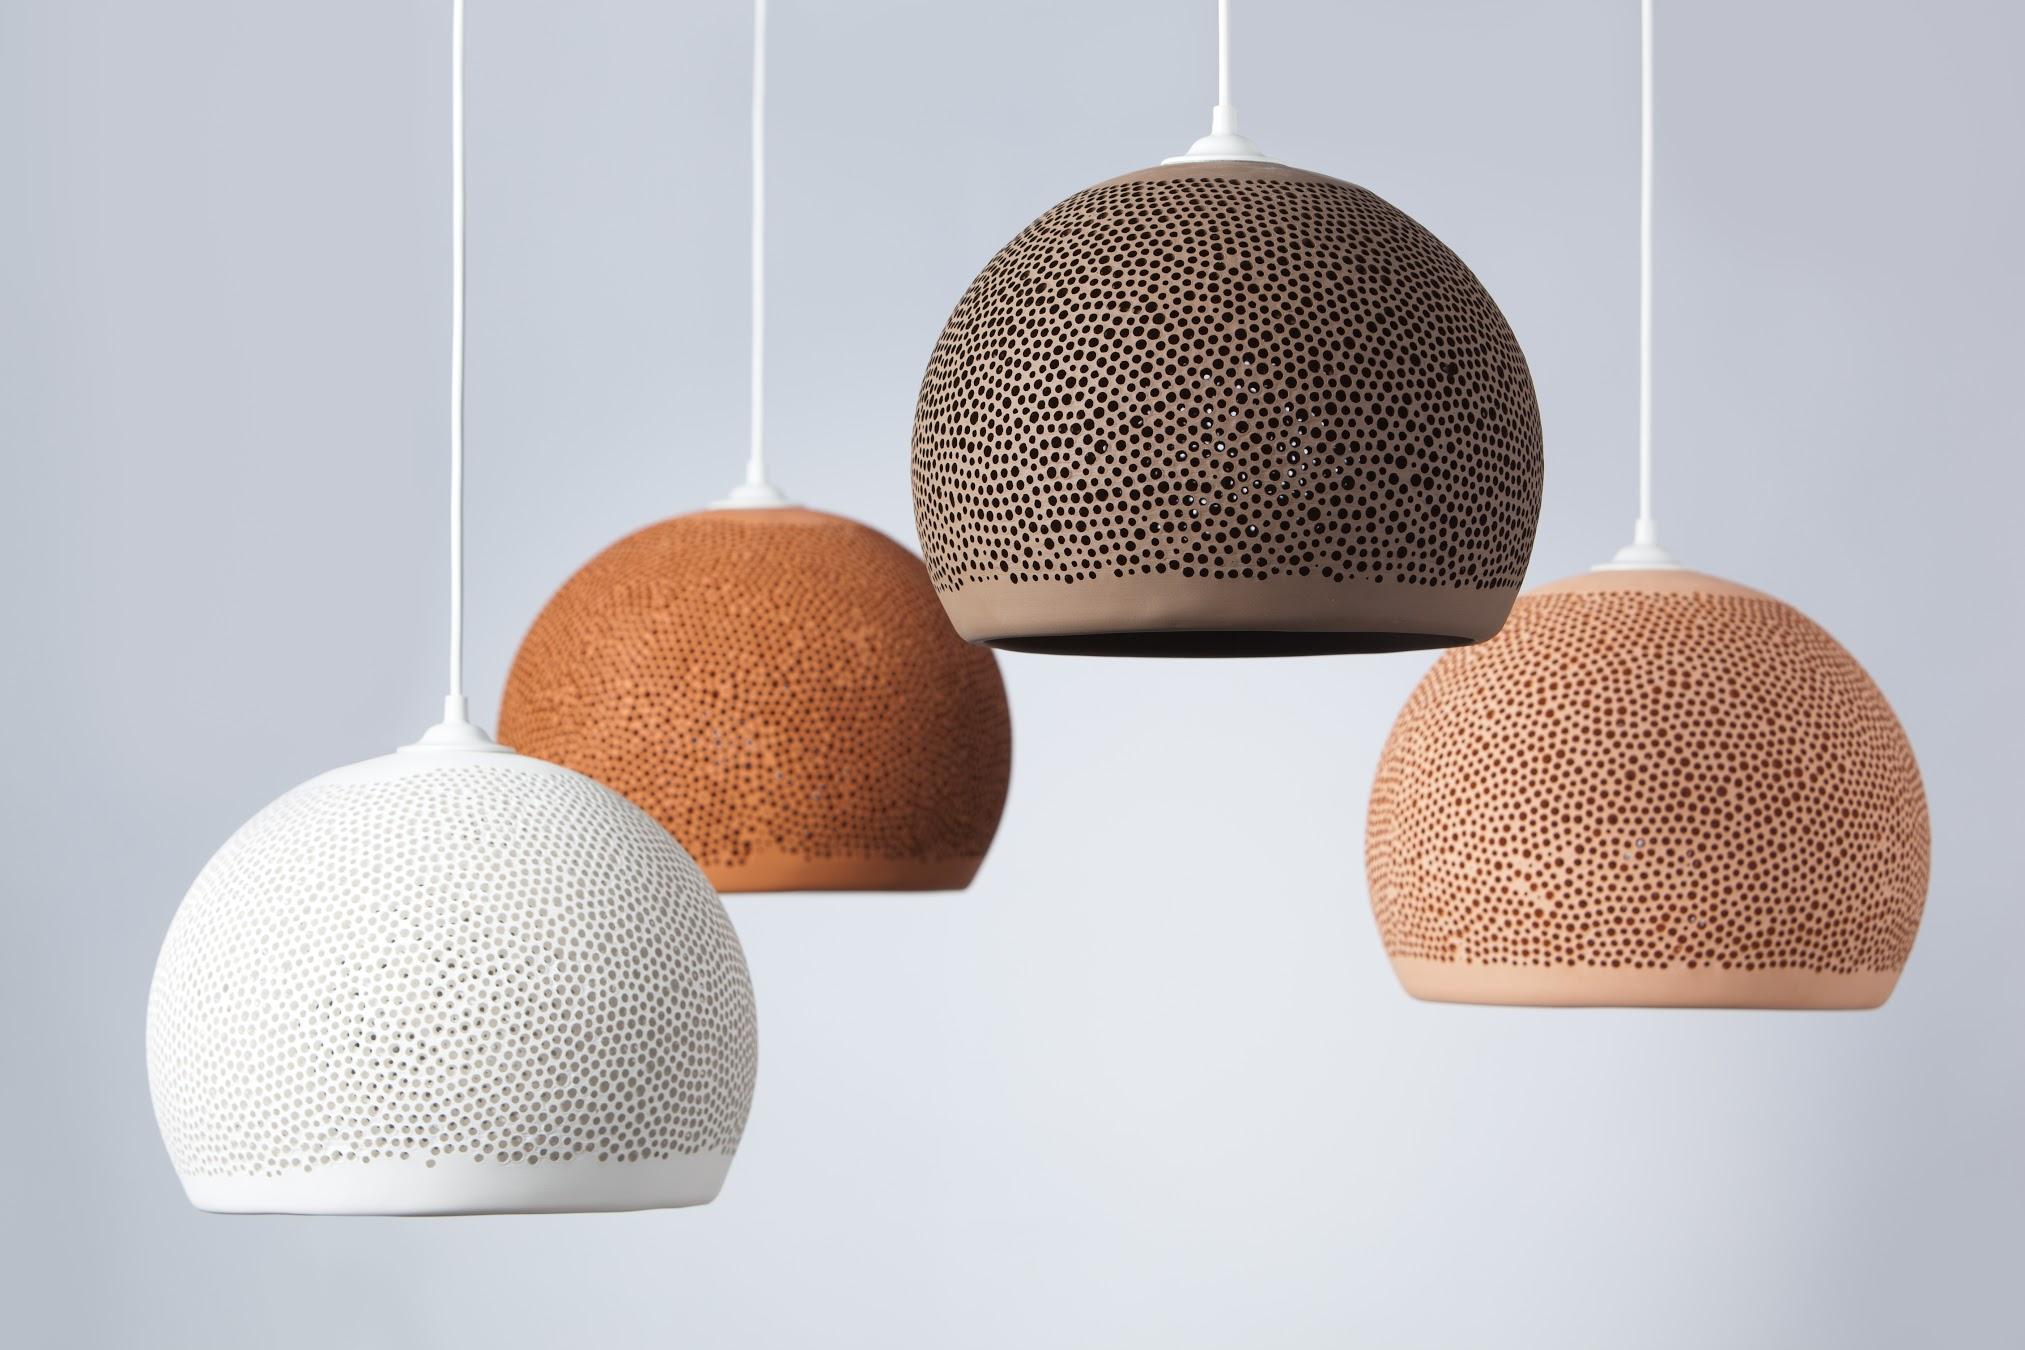 fire farger pott sponge up lamper